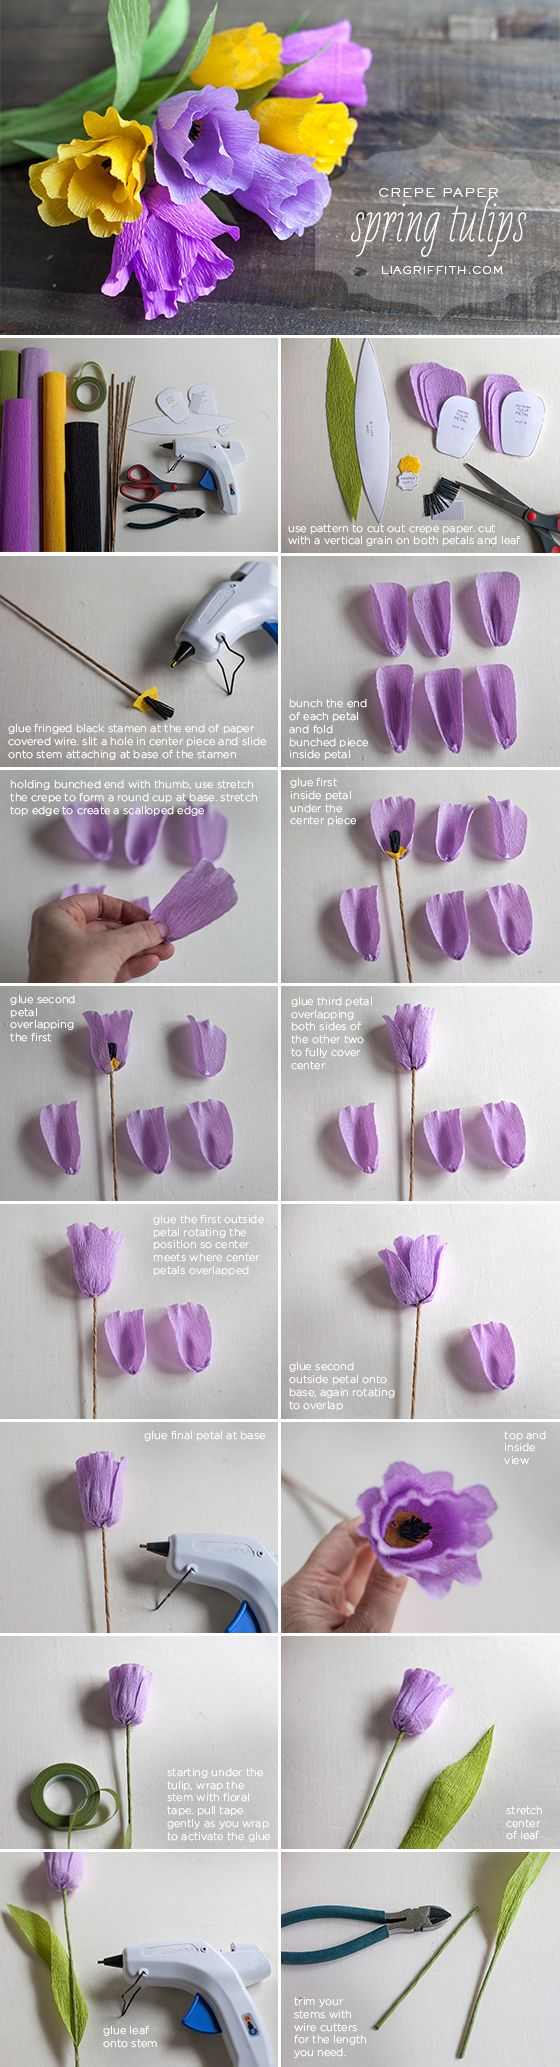 best images about paper bouquets on pinterest